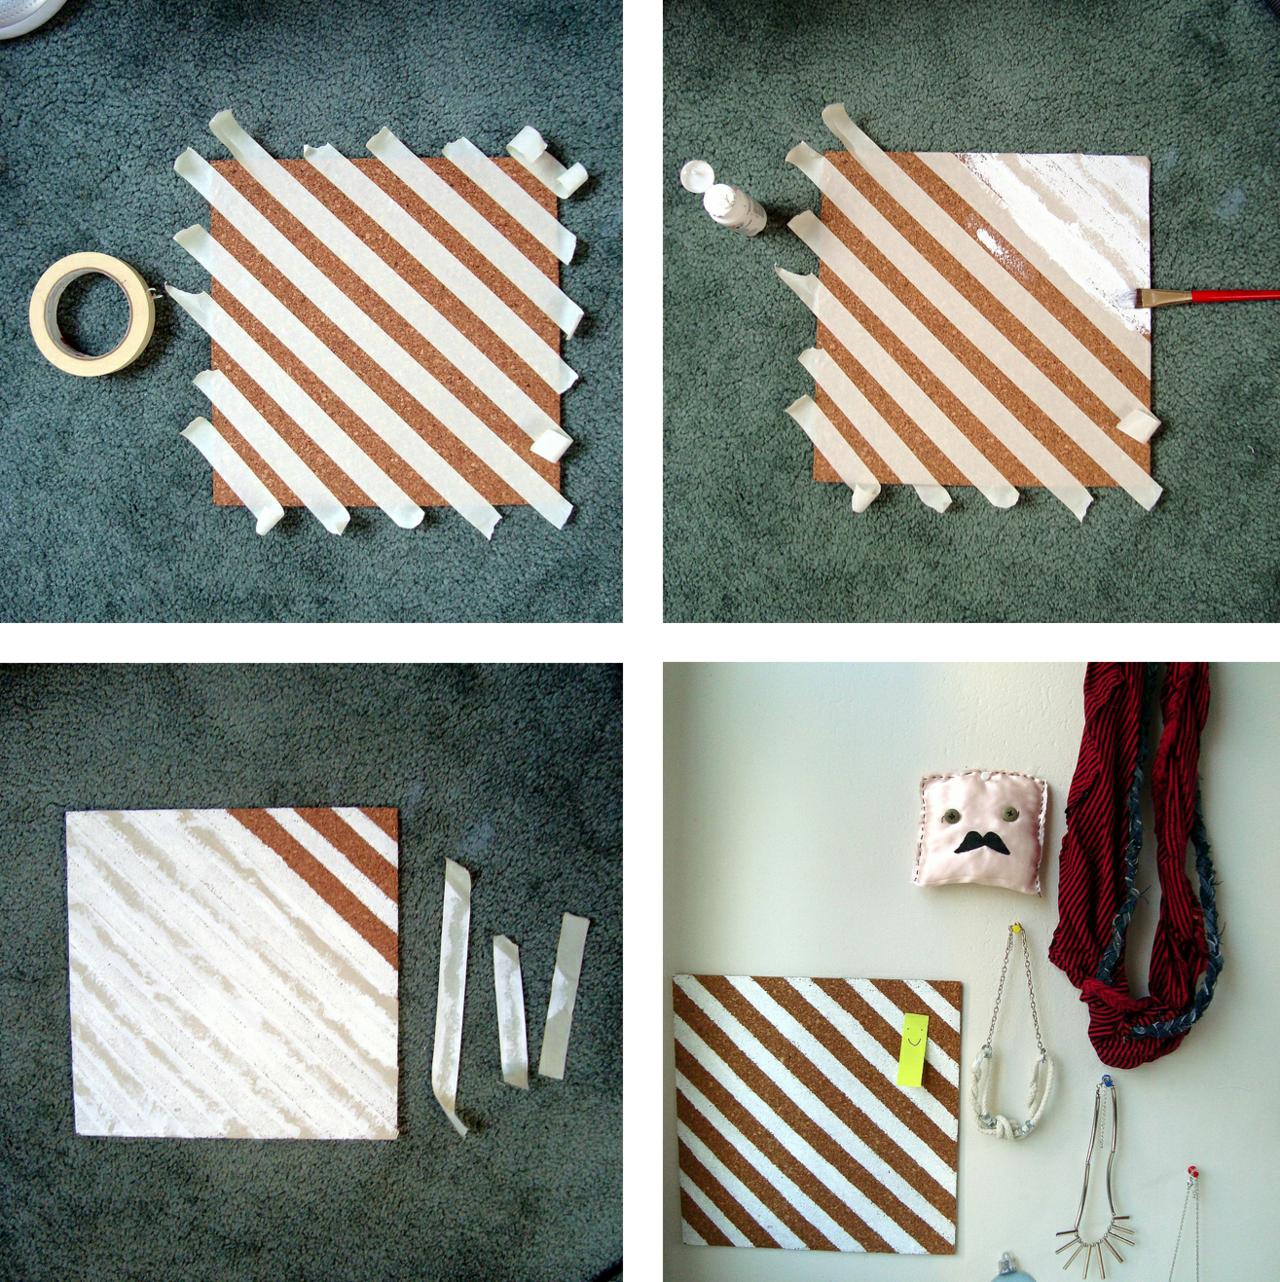 Diy corkboard diagonal striped wall decor - Wall decoration ideas tumblr ...